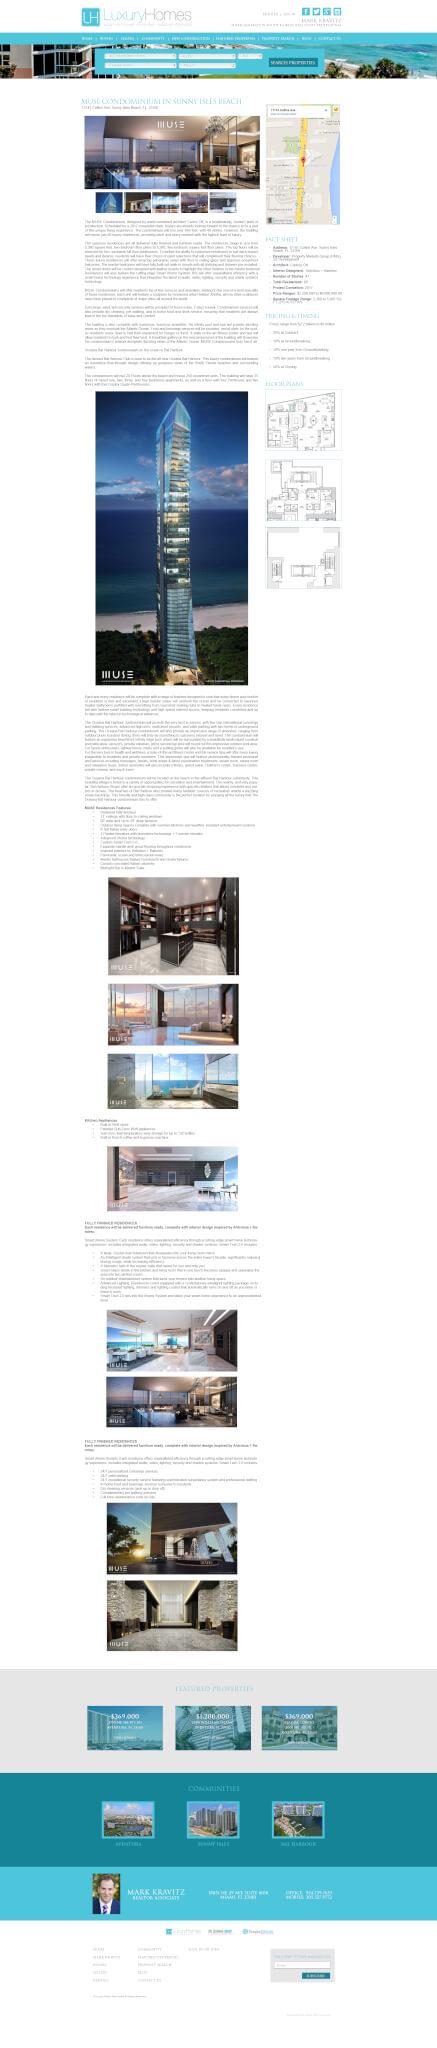 wordpress real estate web site Miami red cat studios